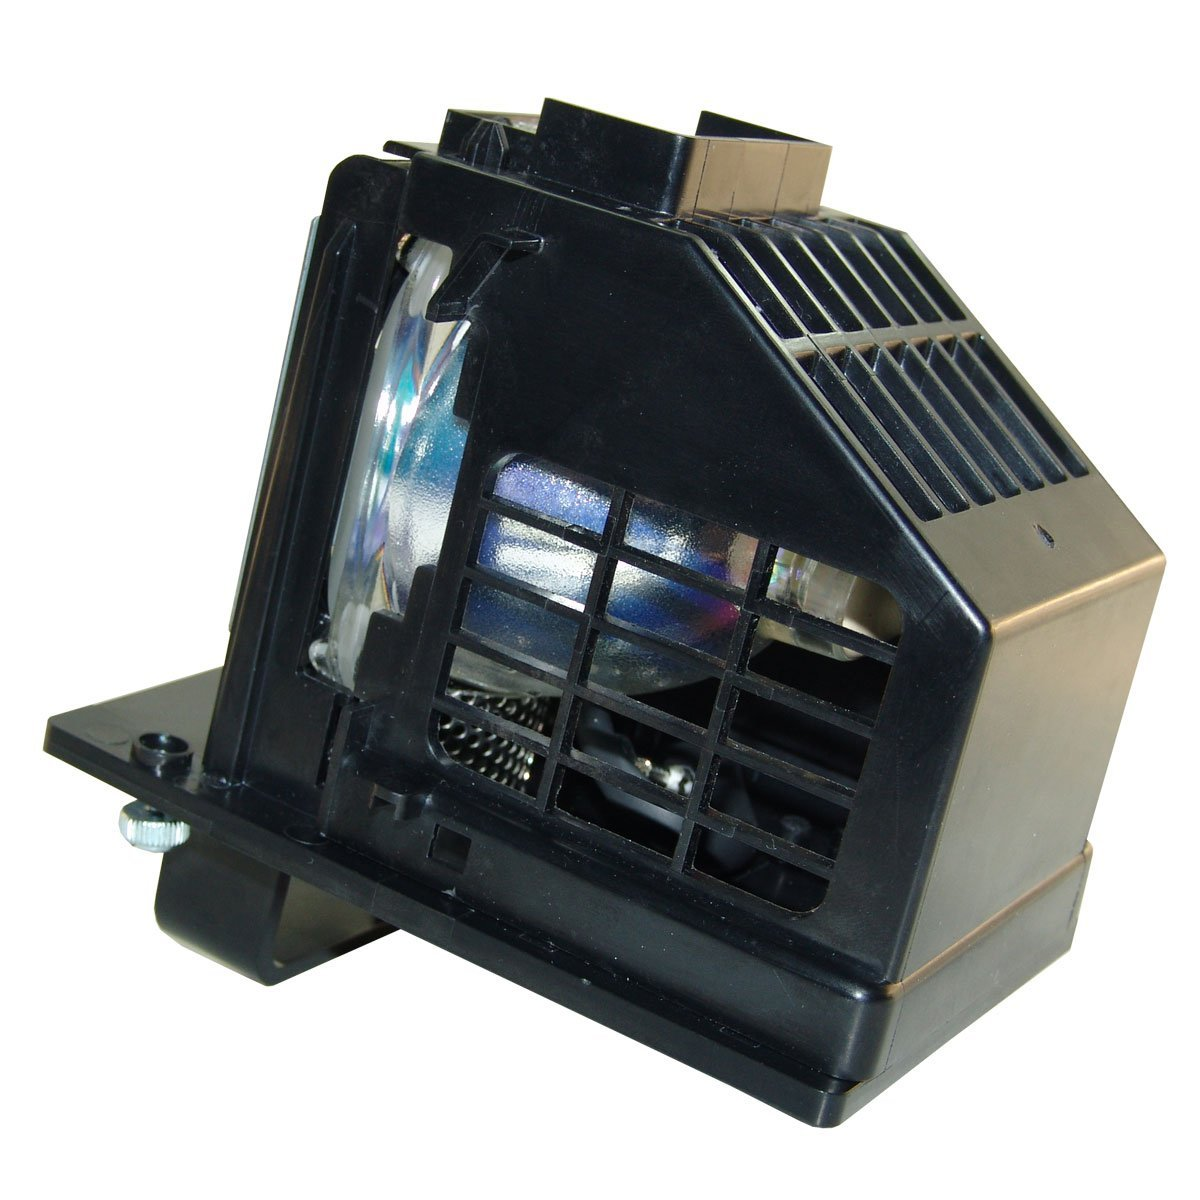 Lutema 915B441001-P Mitsubishi 915B441001 915B441A01 Replacement DLP//LCD Projection TV Lamp Premium